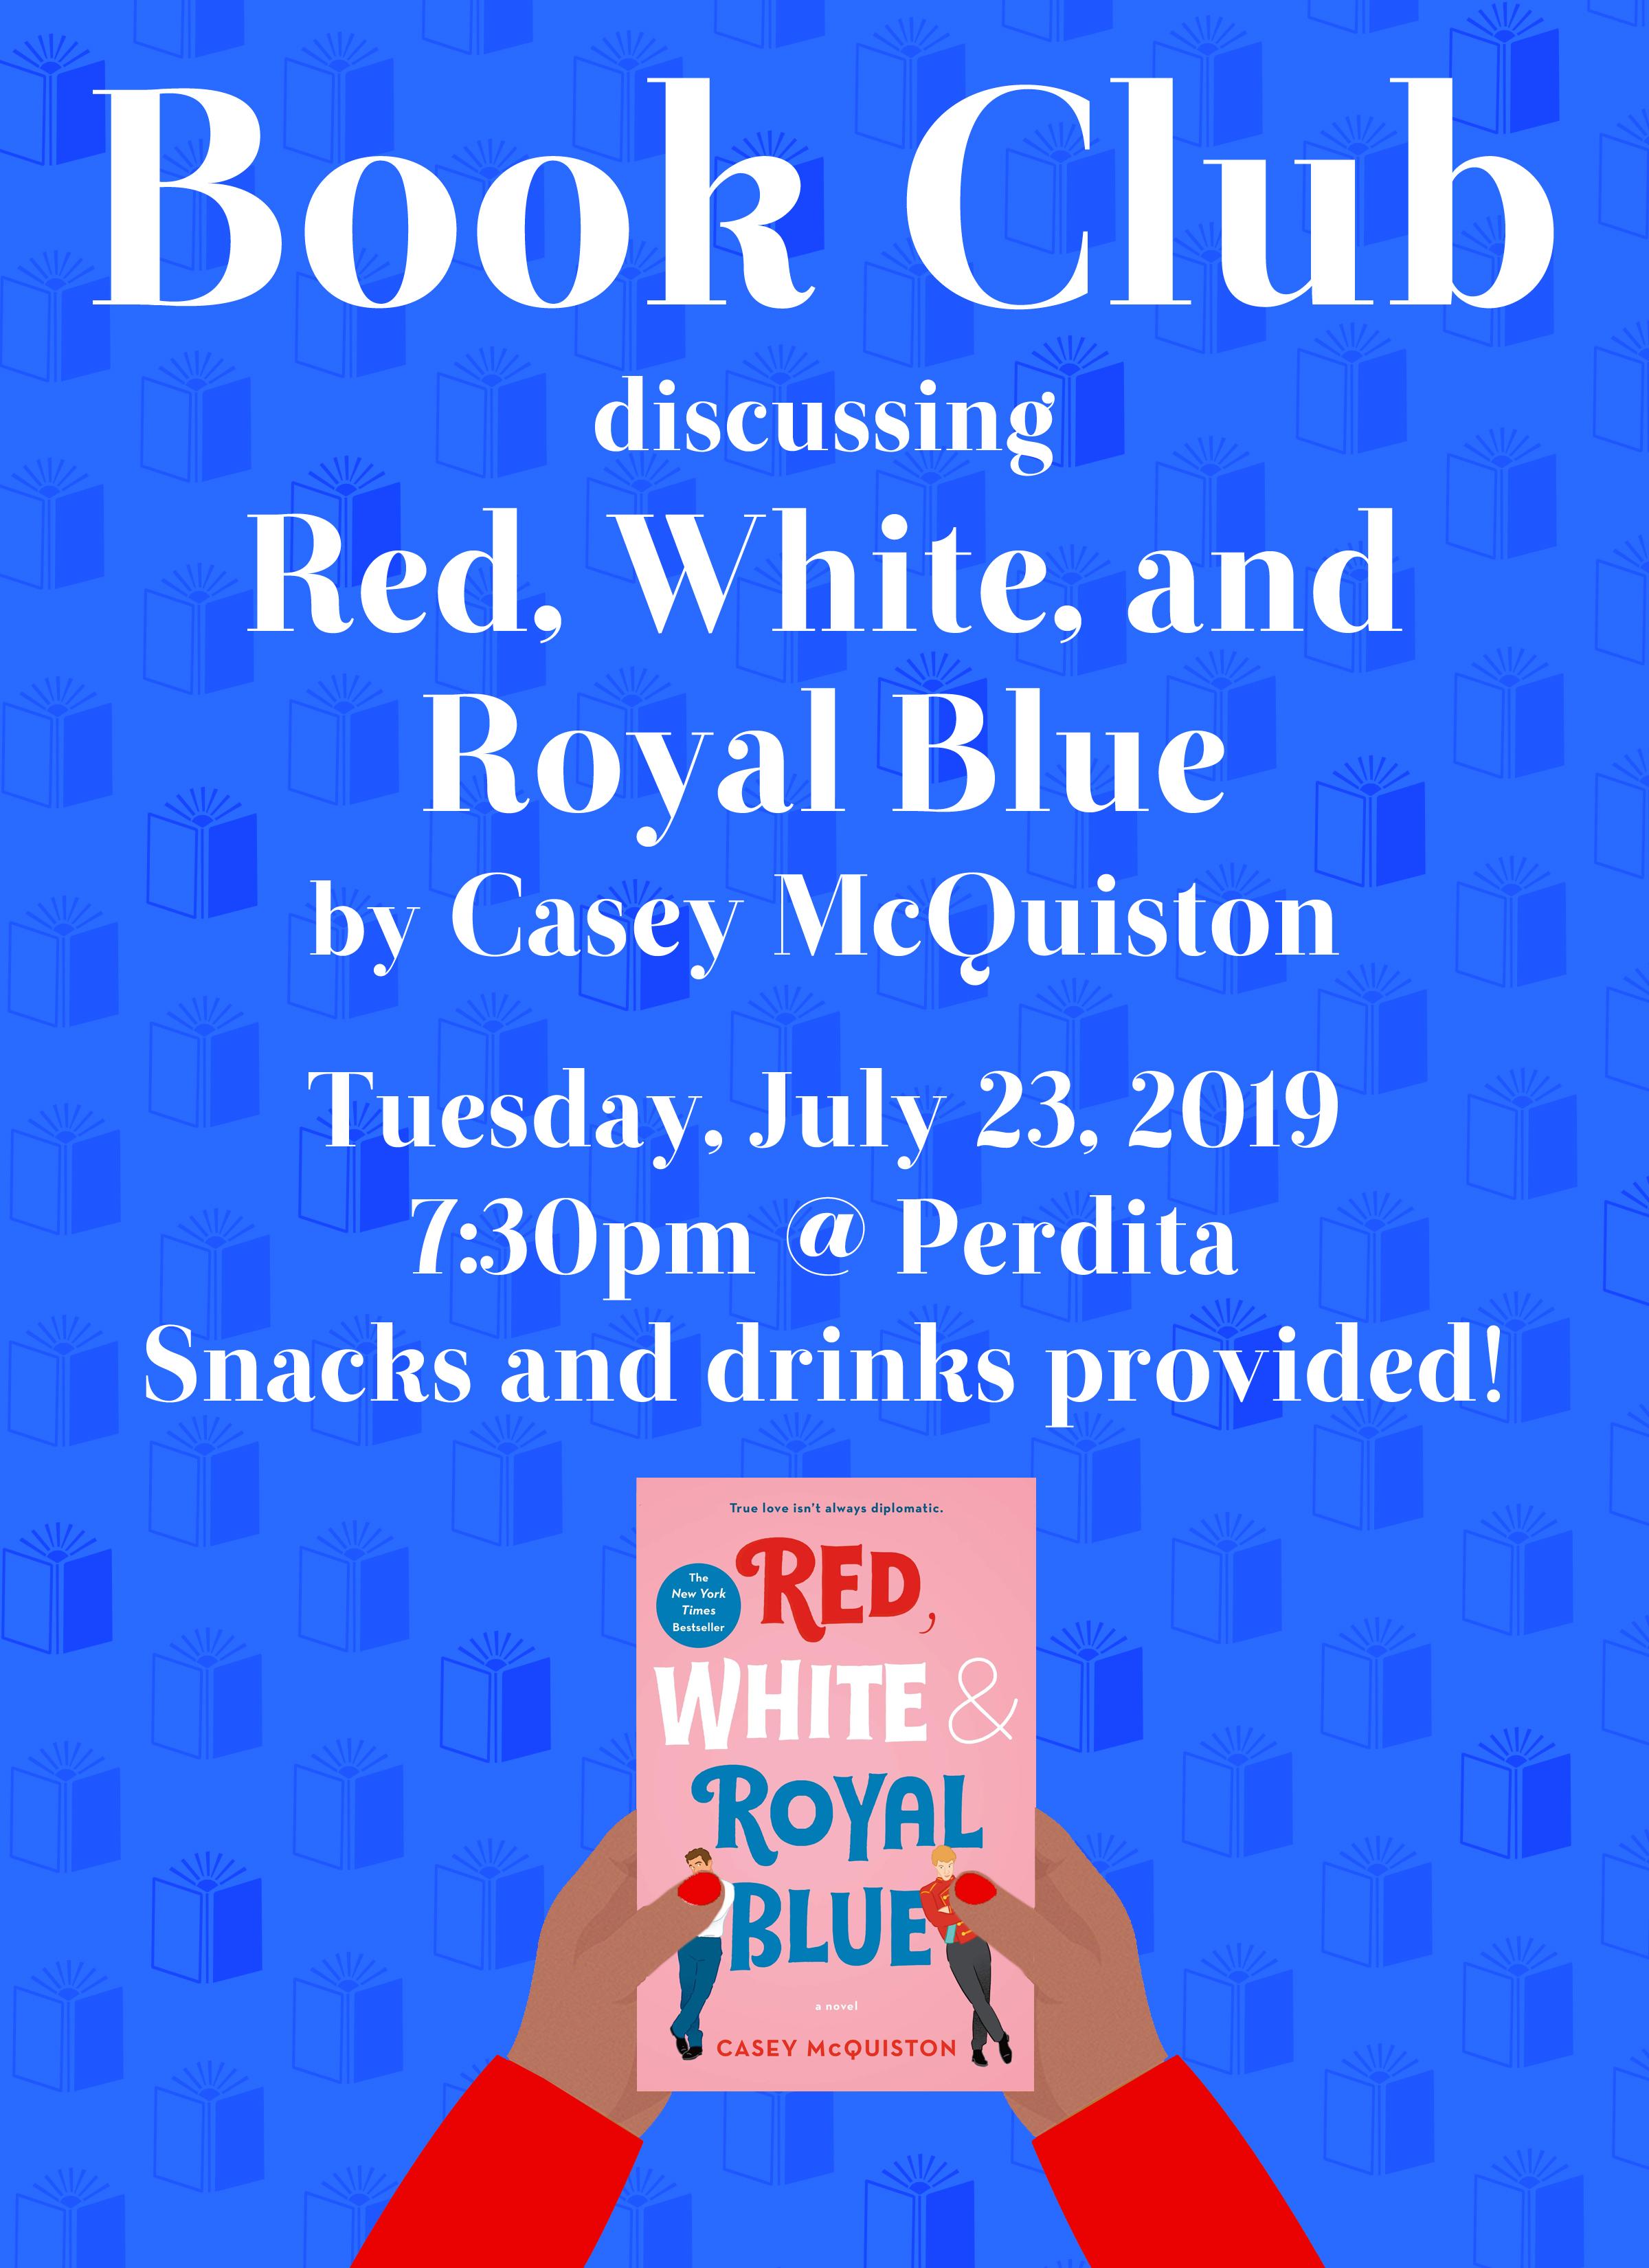 book club invite perdita red white and royal blue.jpg